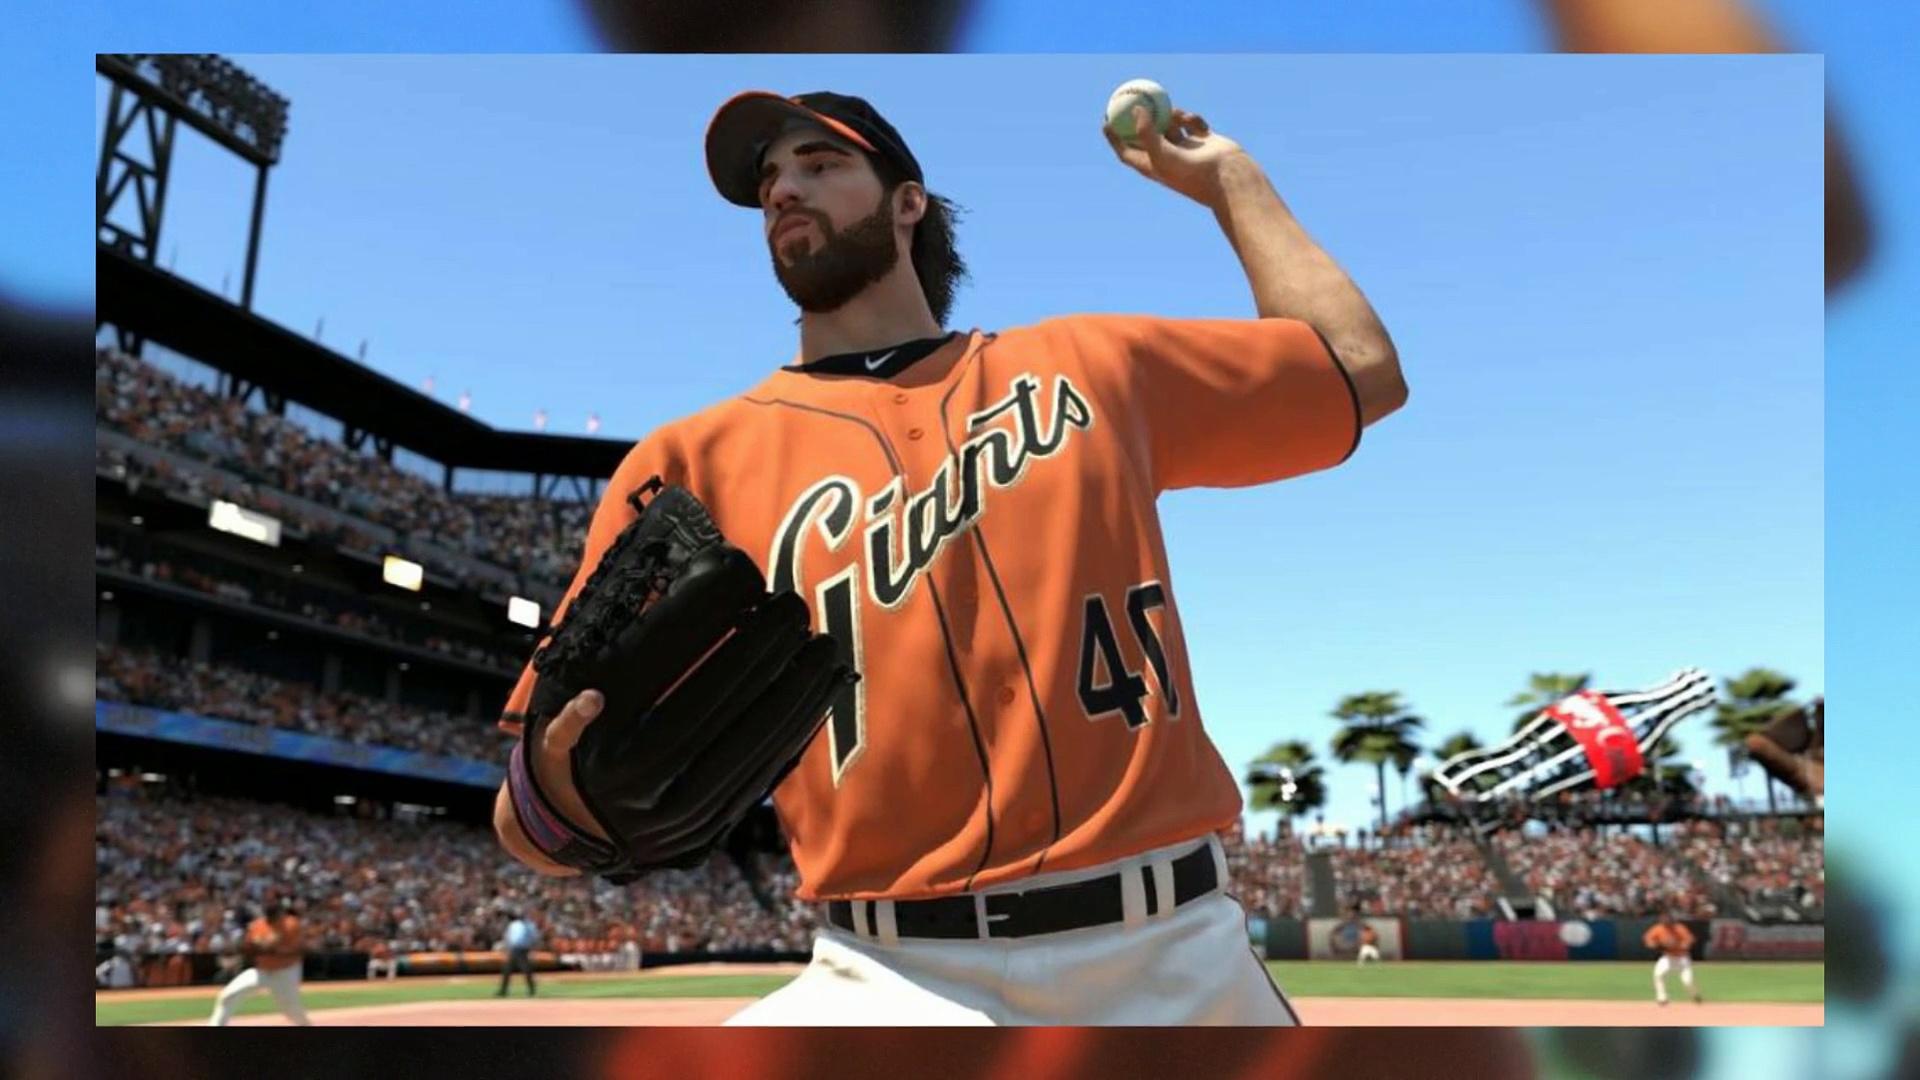 Fantasy Baseball Games Online